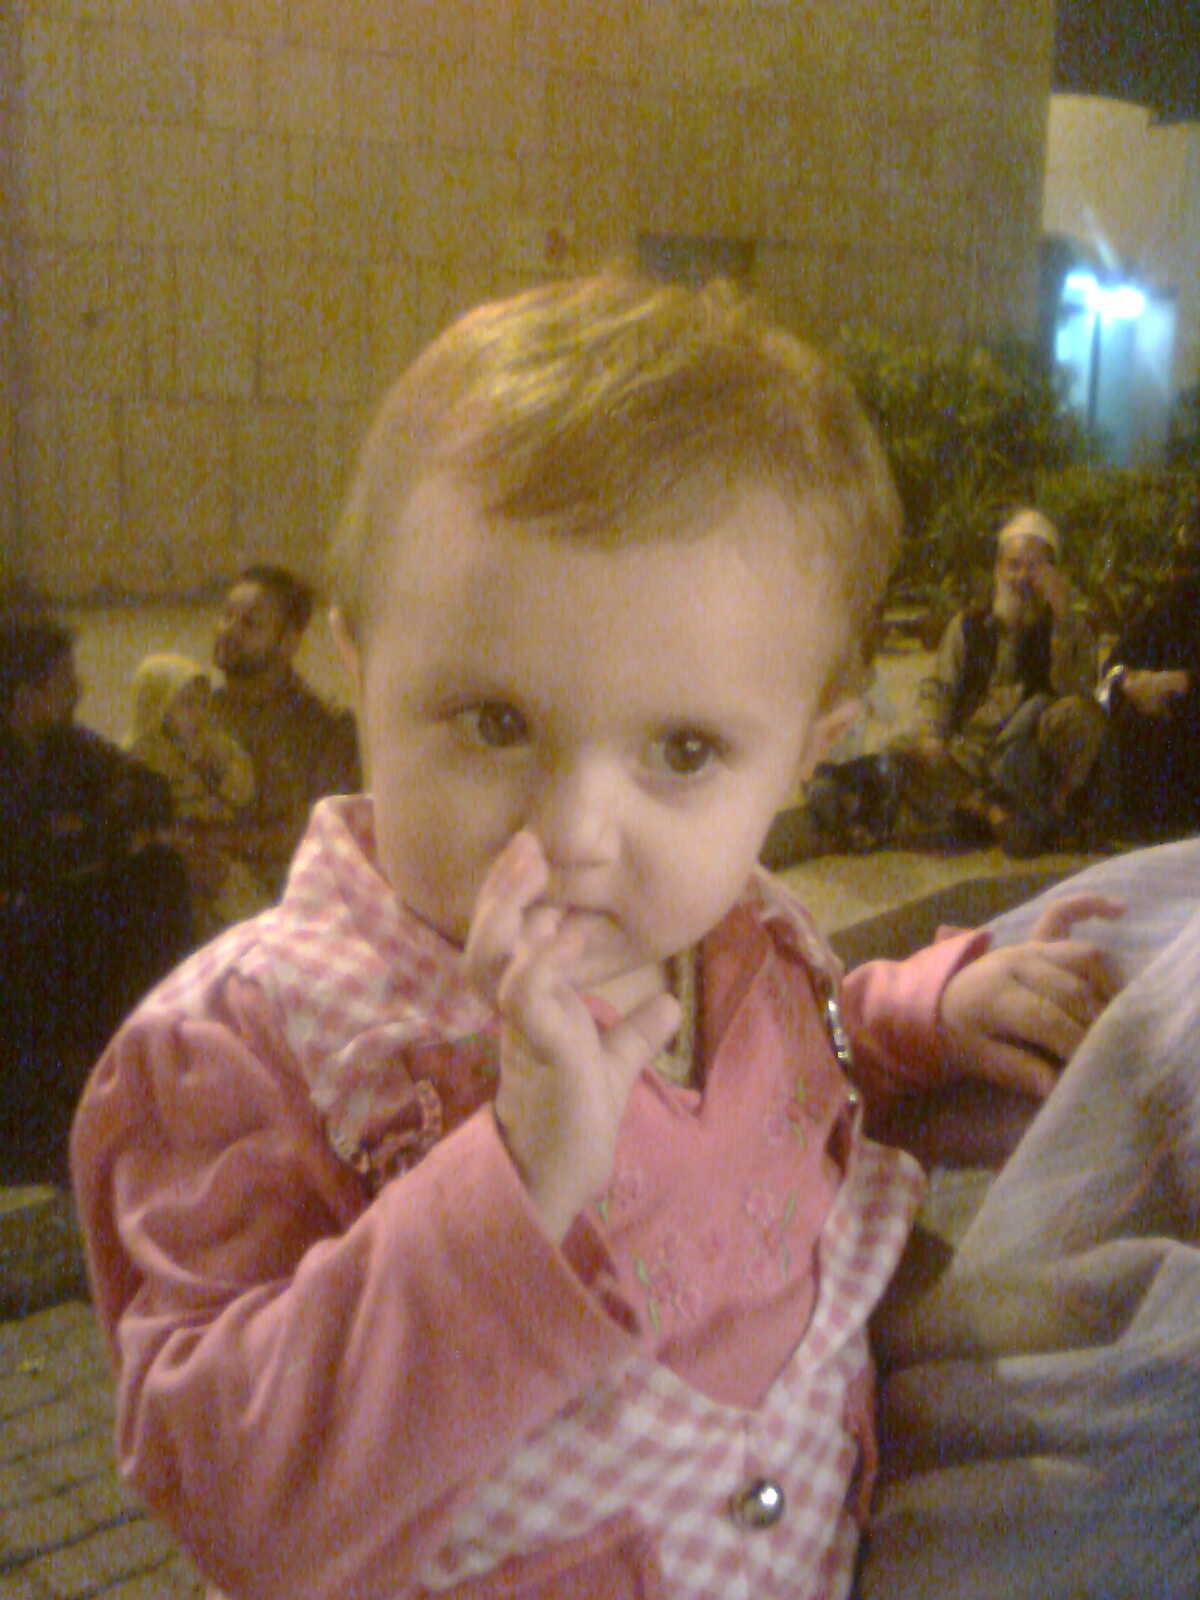 ahmad sonu1: very nice baby